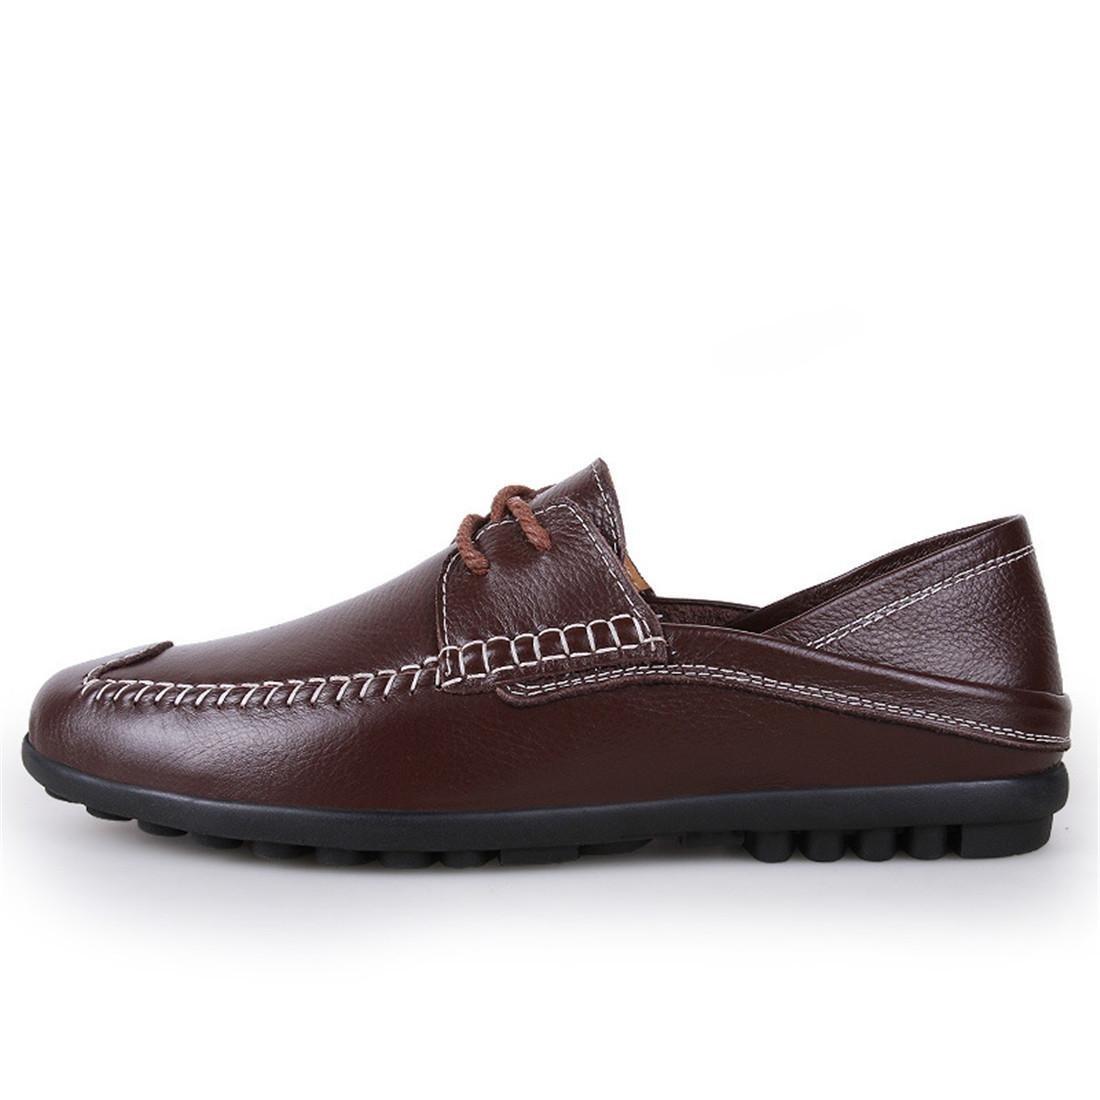 Herren Große Größe Mode Freizeit Lederschuhe Flache Schuhe Mode Baumwollschuhe EUR GRÖSSE 38-45